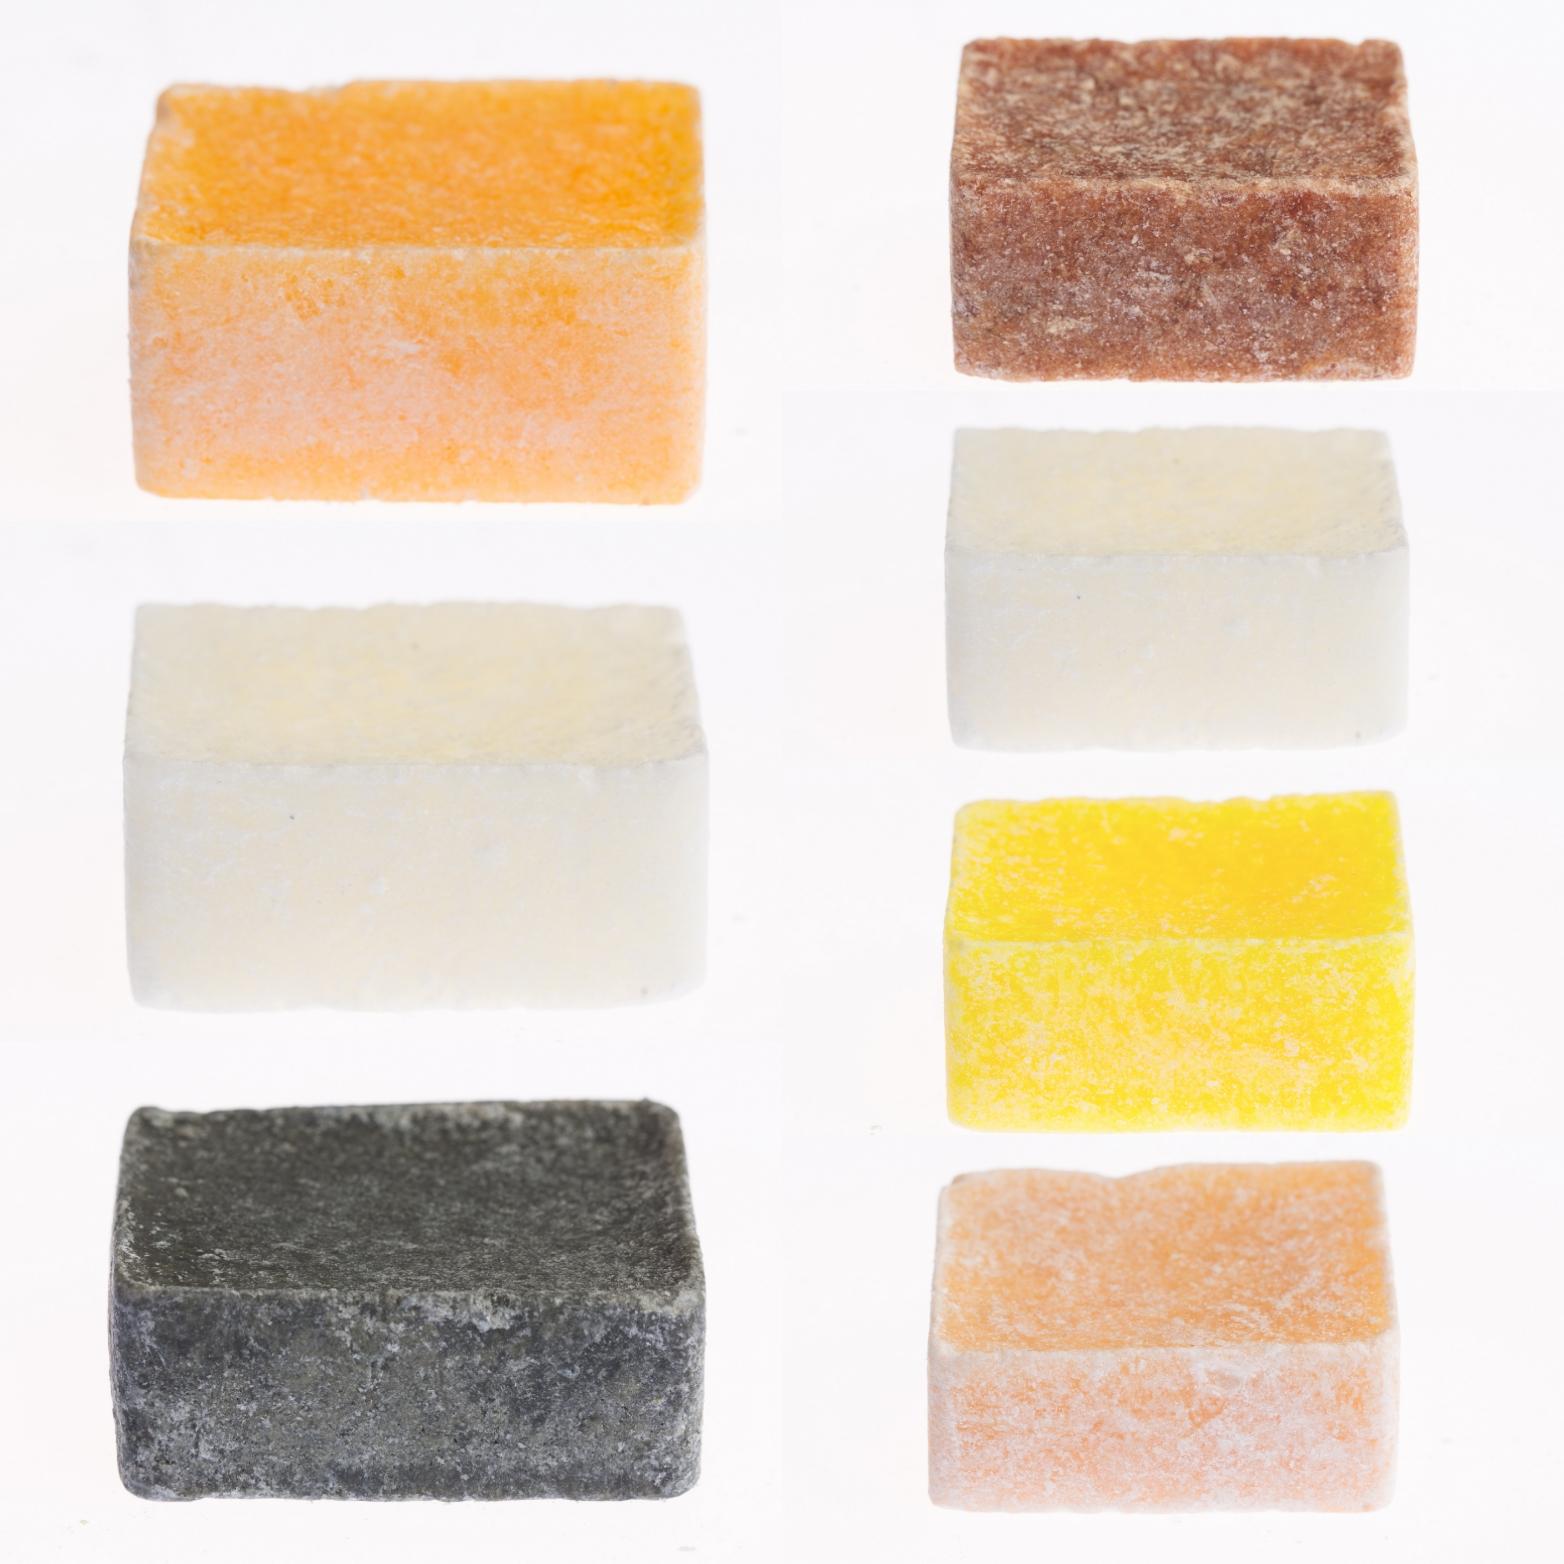 7 verschillende amberblokjes